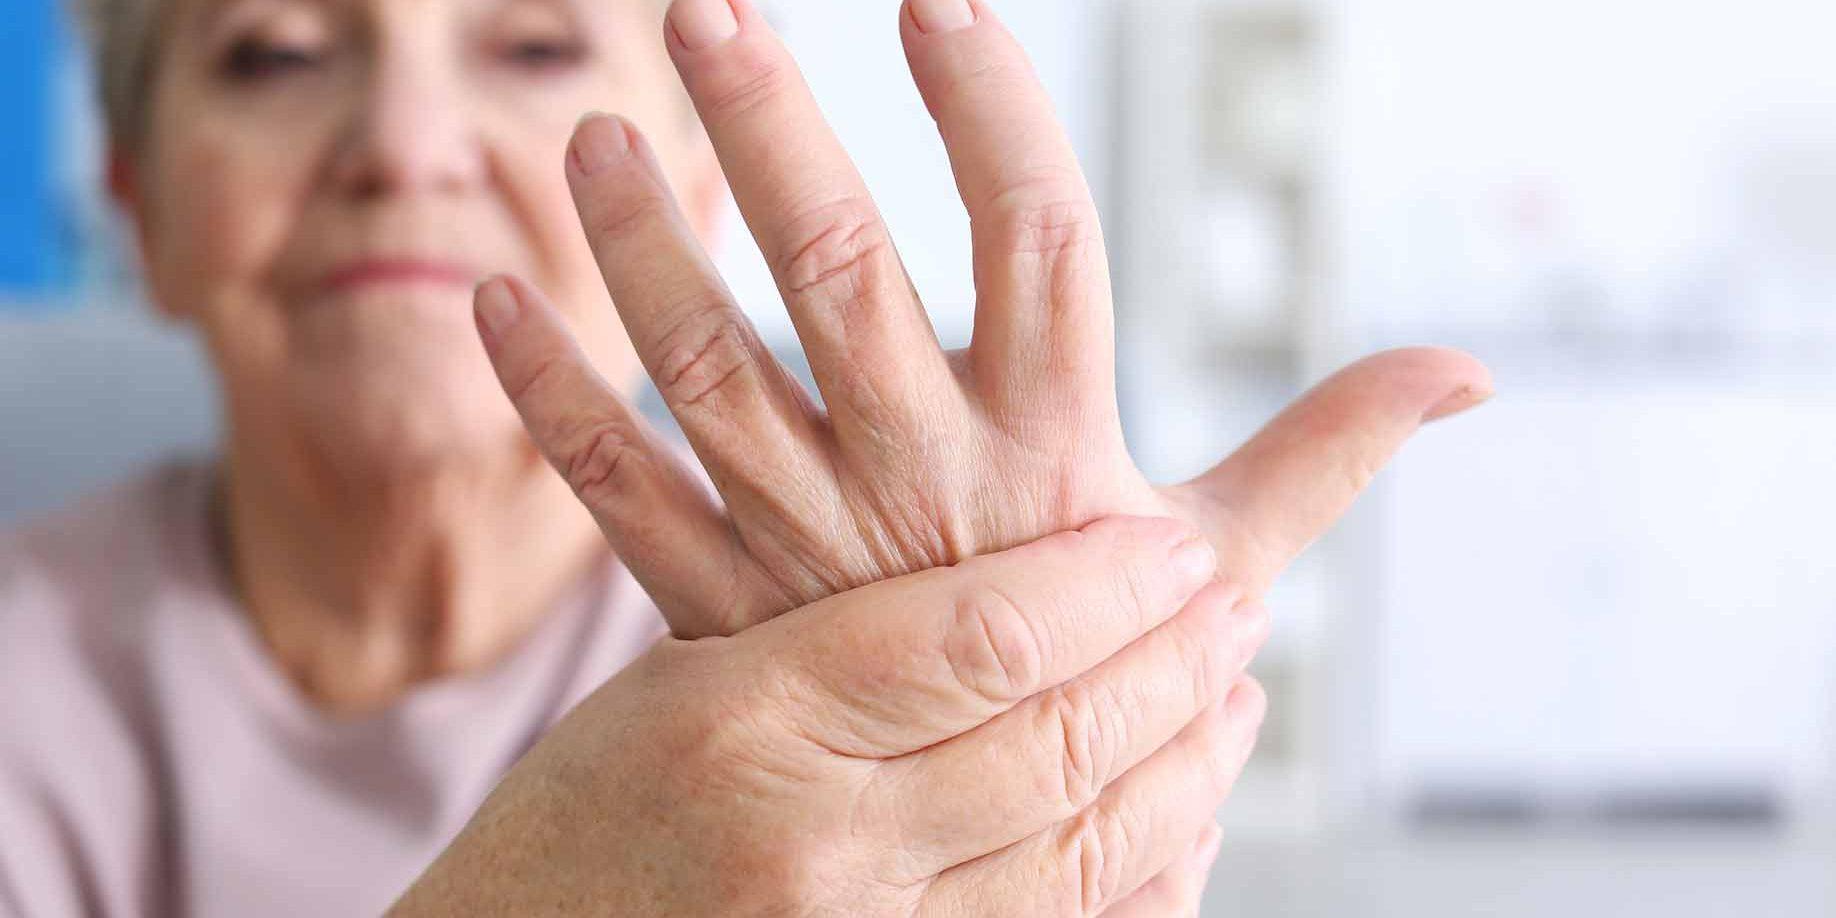 mazgelis artrozė šepečiai gydymo